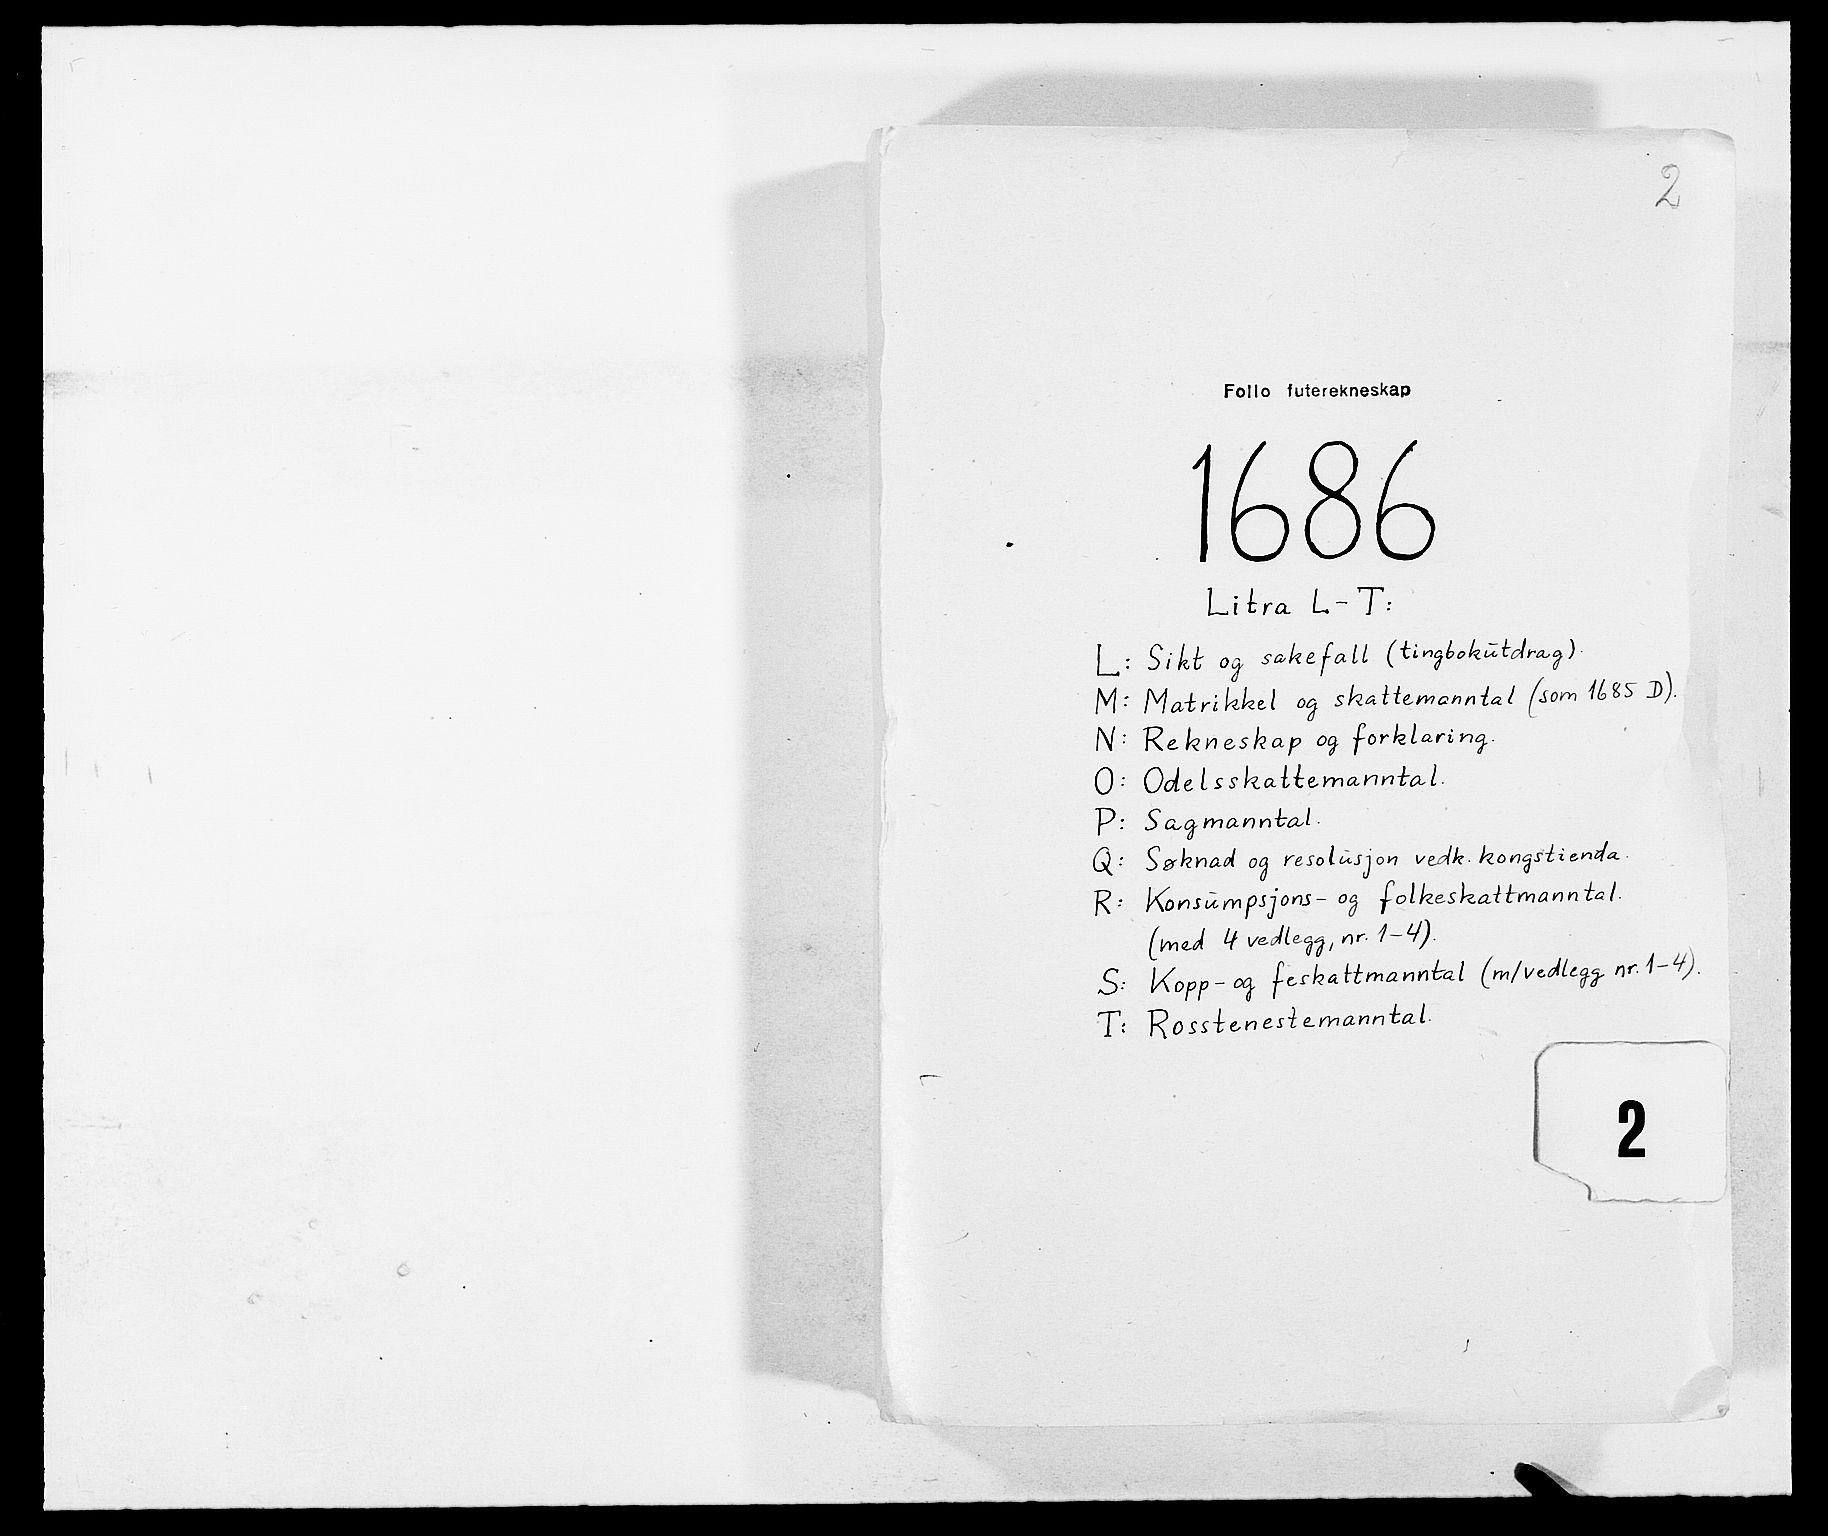 RA, Rentekammeret inntil 1814, Reviderte regnskaper, Fogderegnskap, R09/L0433: Fogderegnskap Follo, 1685-1686, s. 236